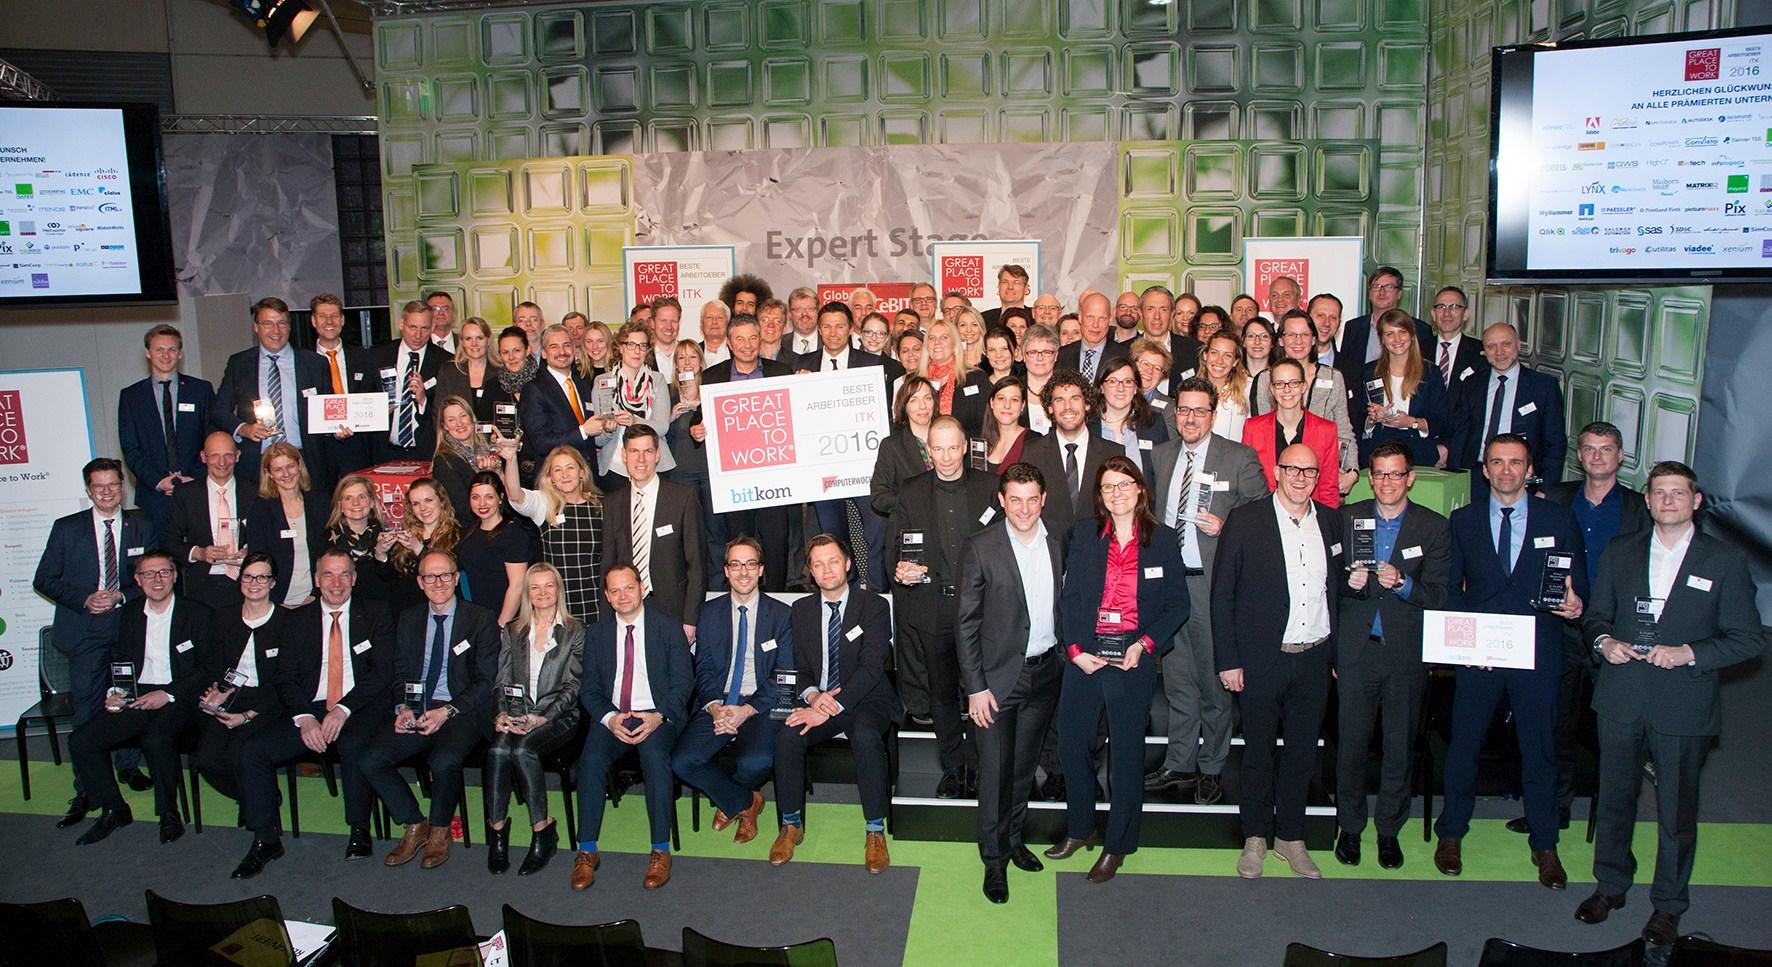 foto Beste Arbeitgeber in der ITK 2016 - Fotografie Przybyla